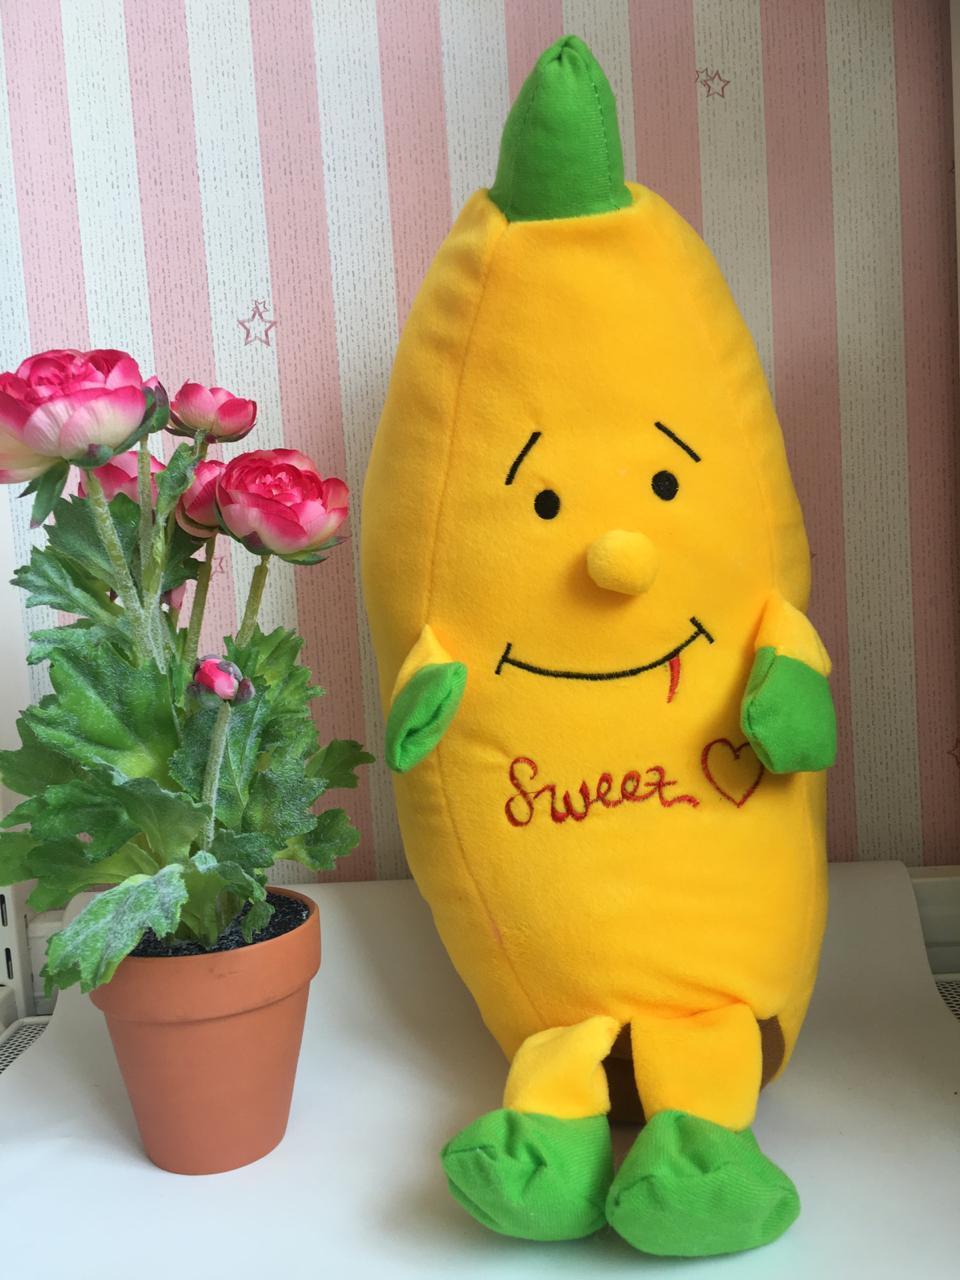 Boneka Pisang Banana Yellow 50 Cm By Dekiddos.